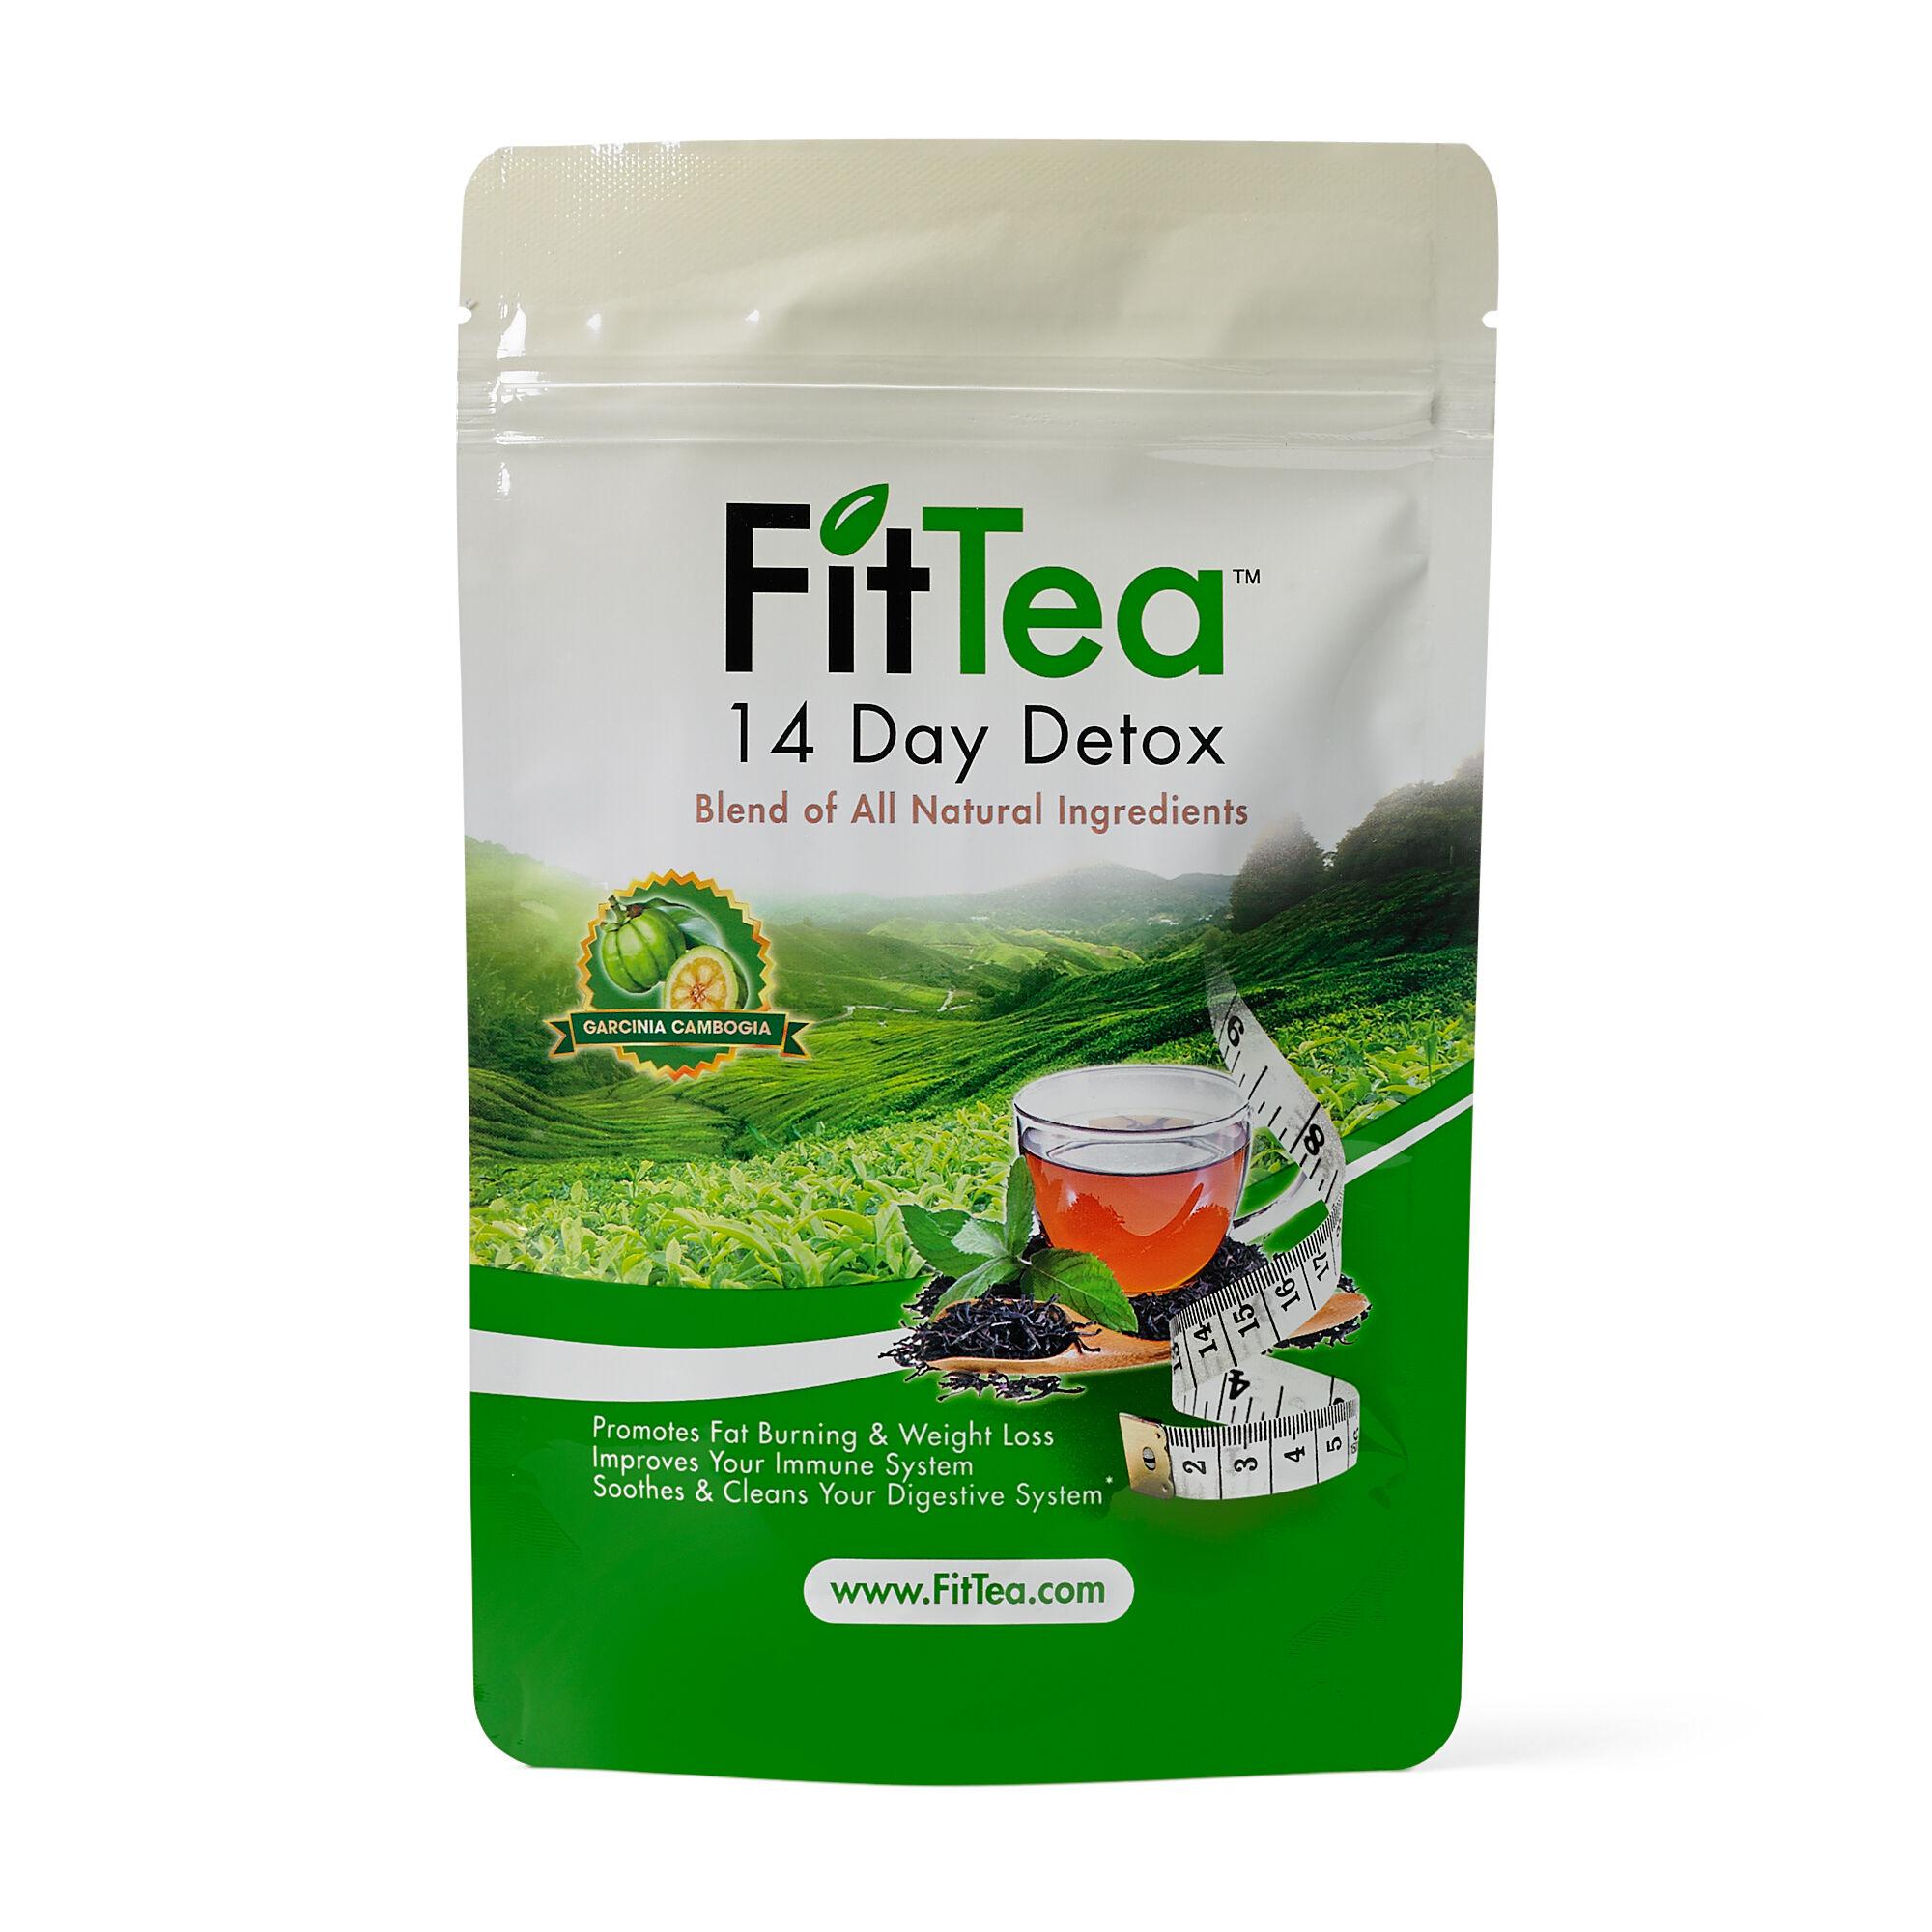 31b3f6140d8 FitTea™ 14 Day Detox | GNC